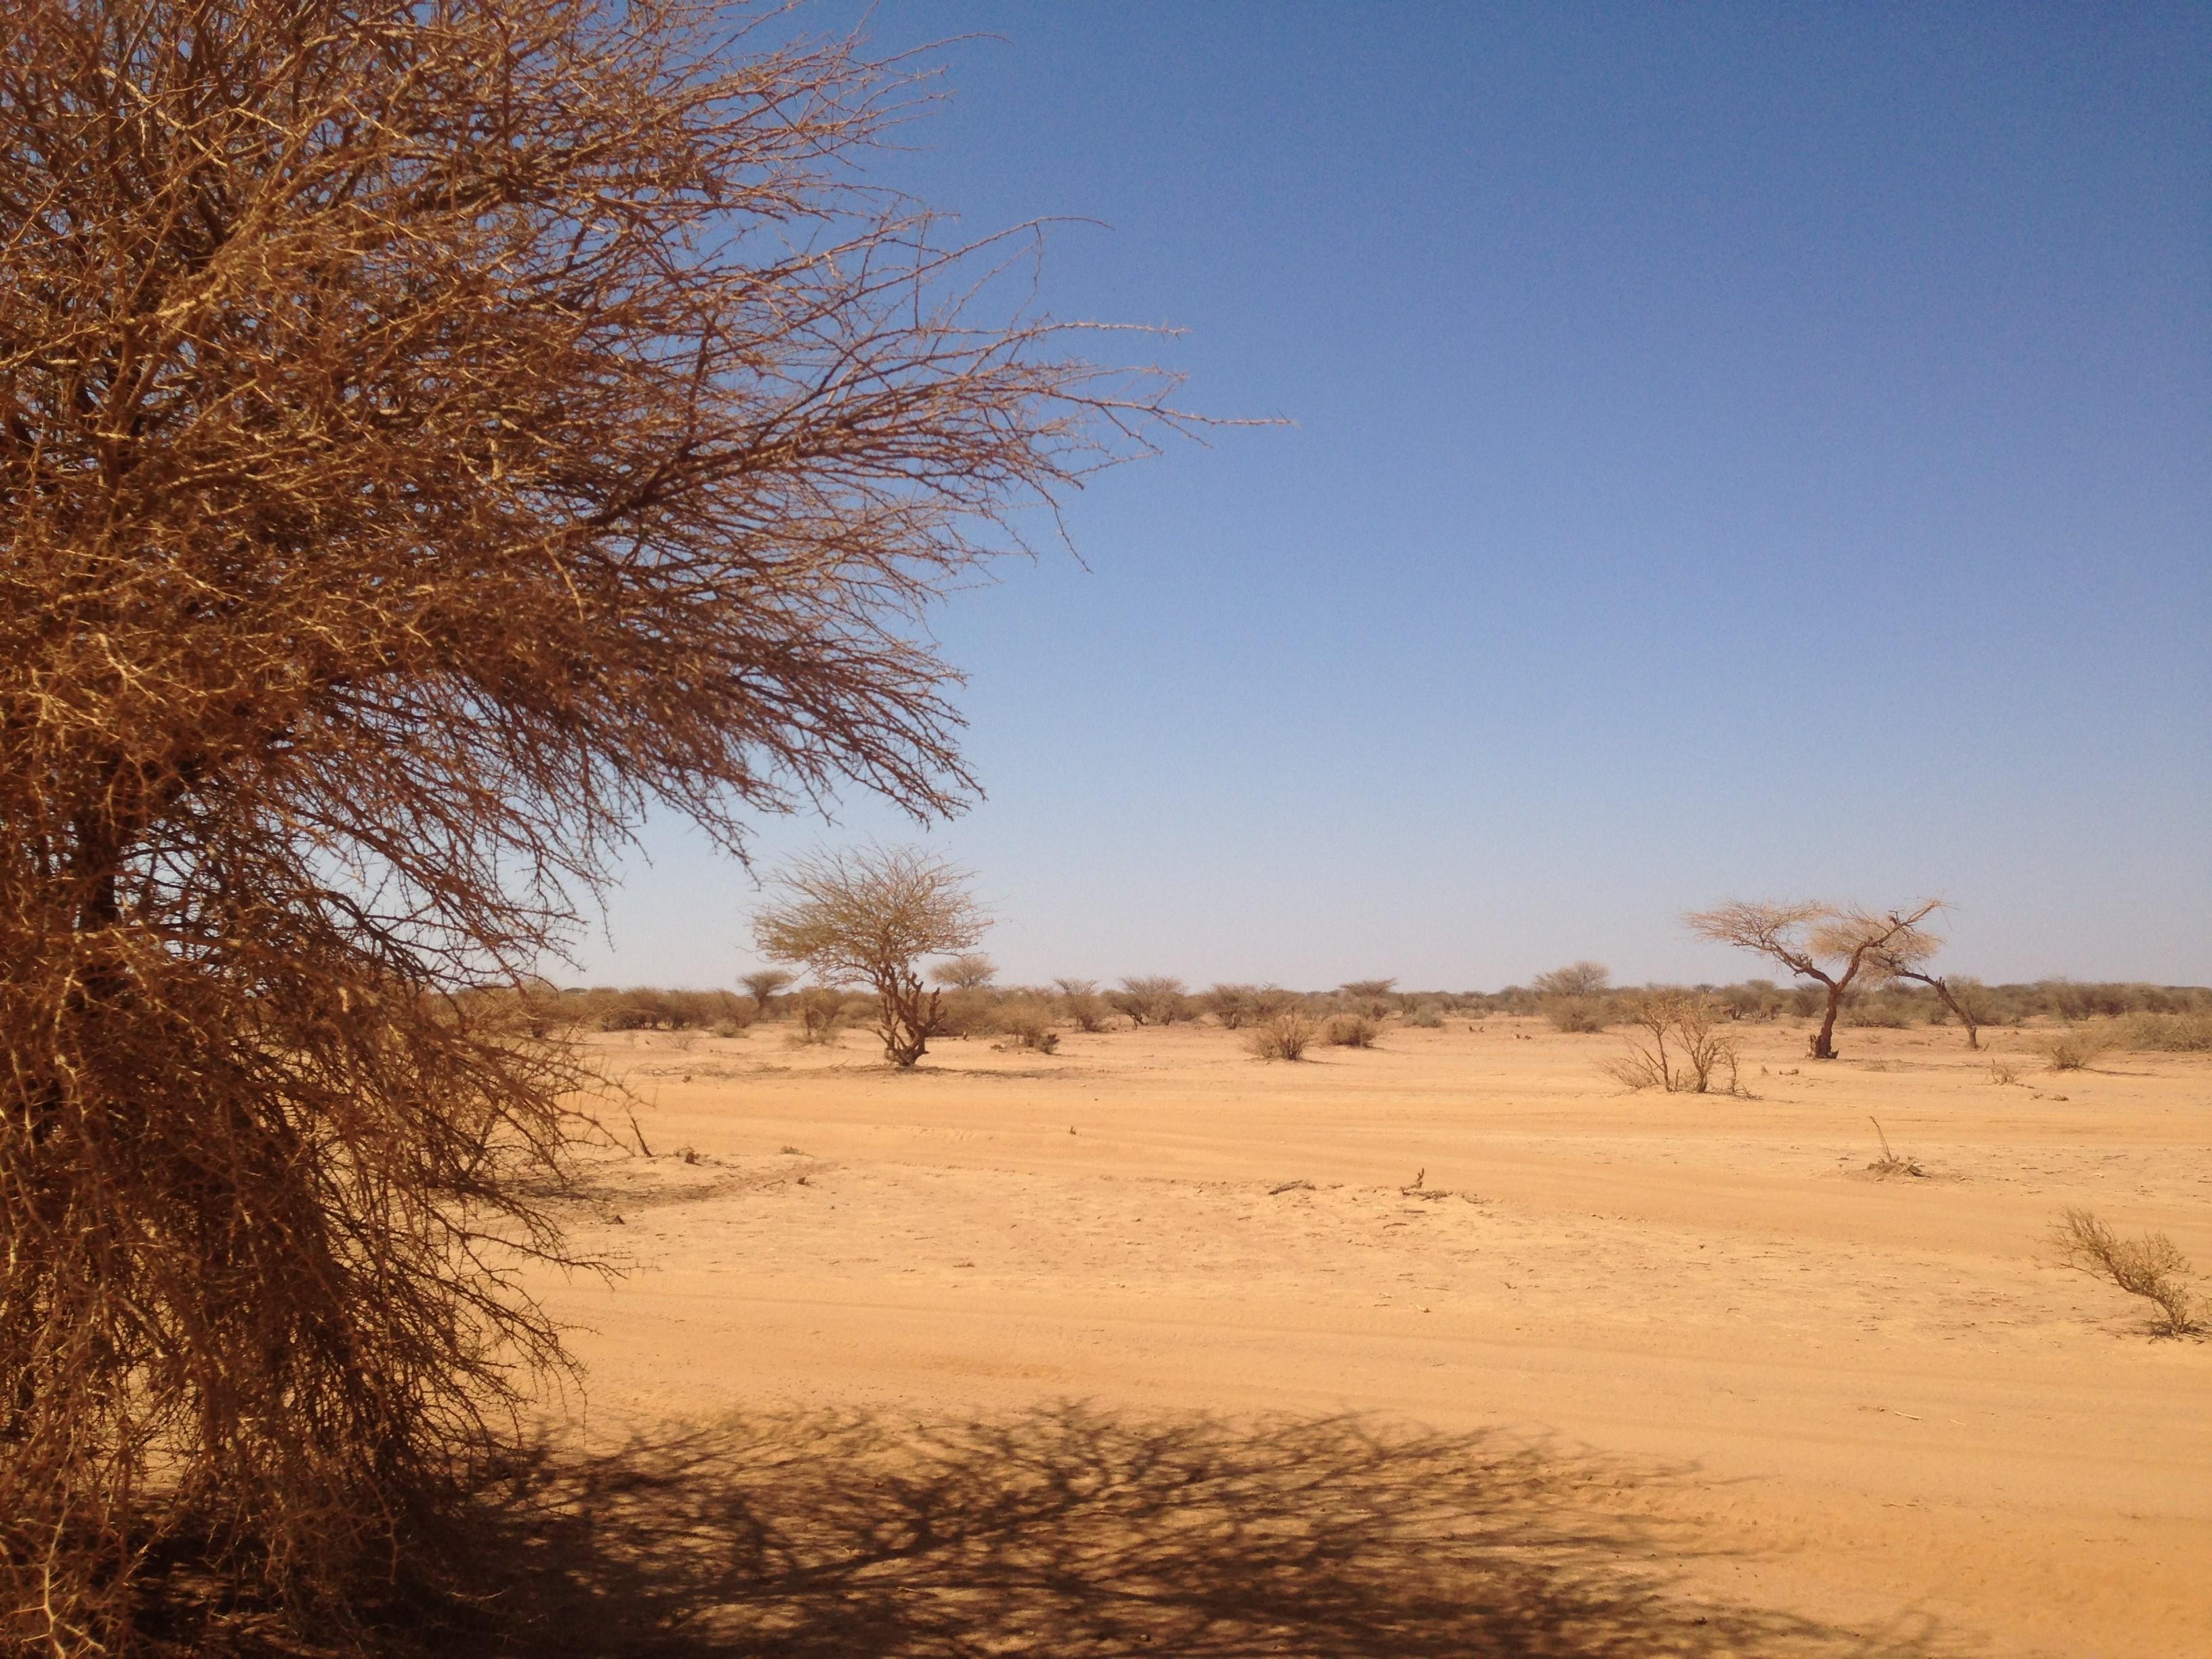 Preventing Violent Extremism Through Livelihood Innovations in Kenya and Somalia